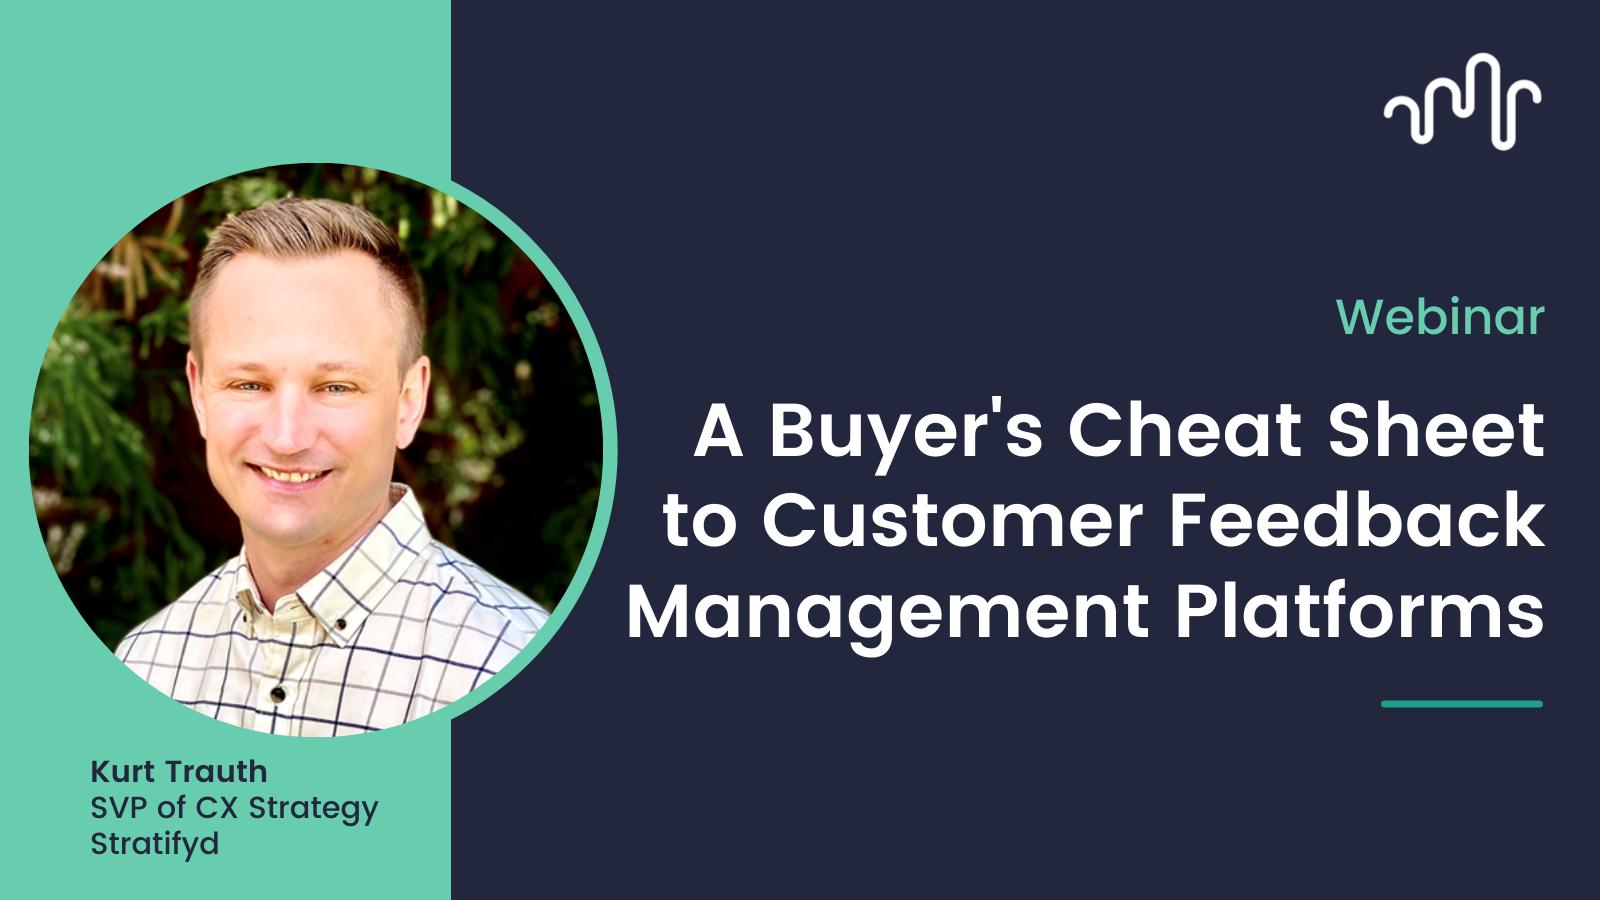 A Buyer's Cheat Sheet to Customer Feedback Management Platforms